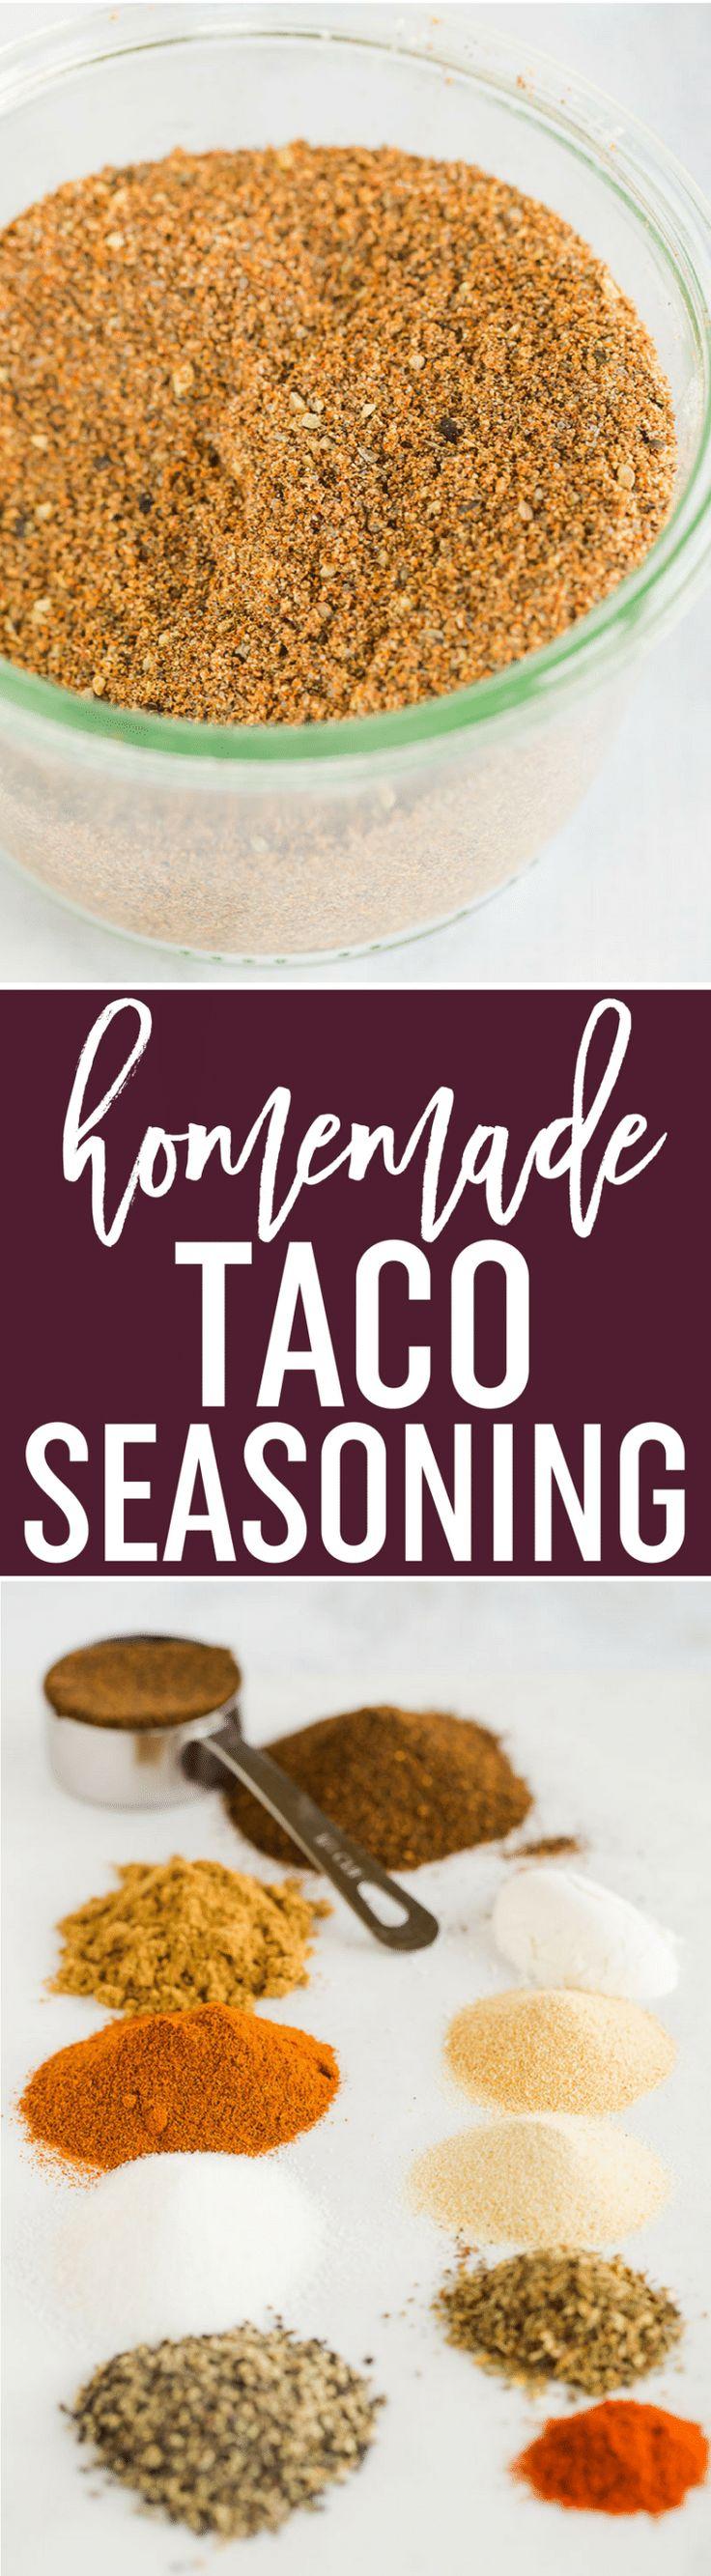 Best 25+ Homemade Tacos ideas on Pinterest   Taco ideas ...